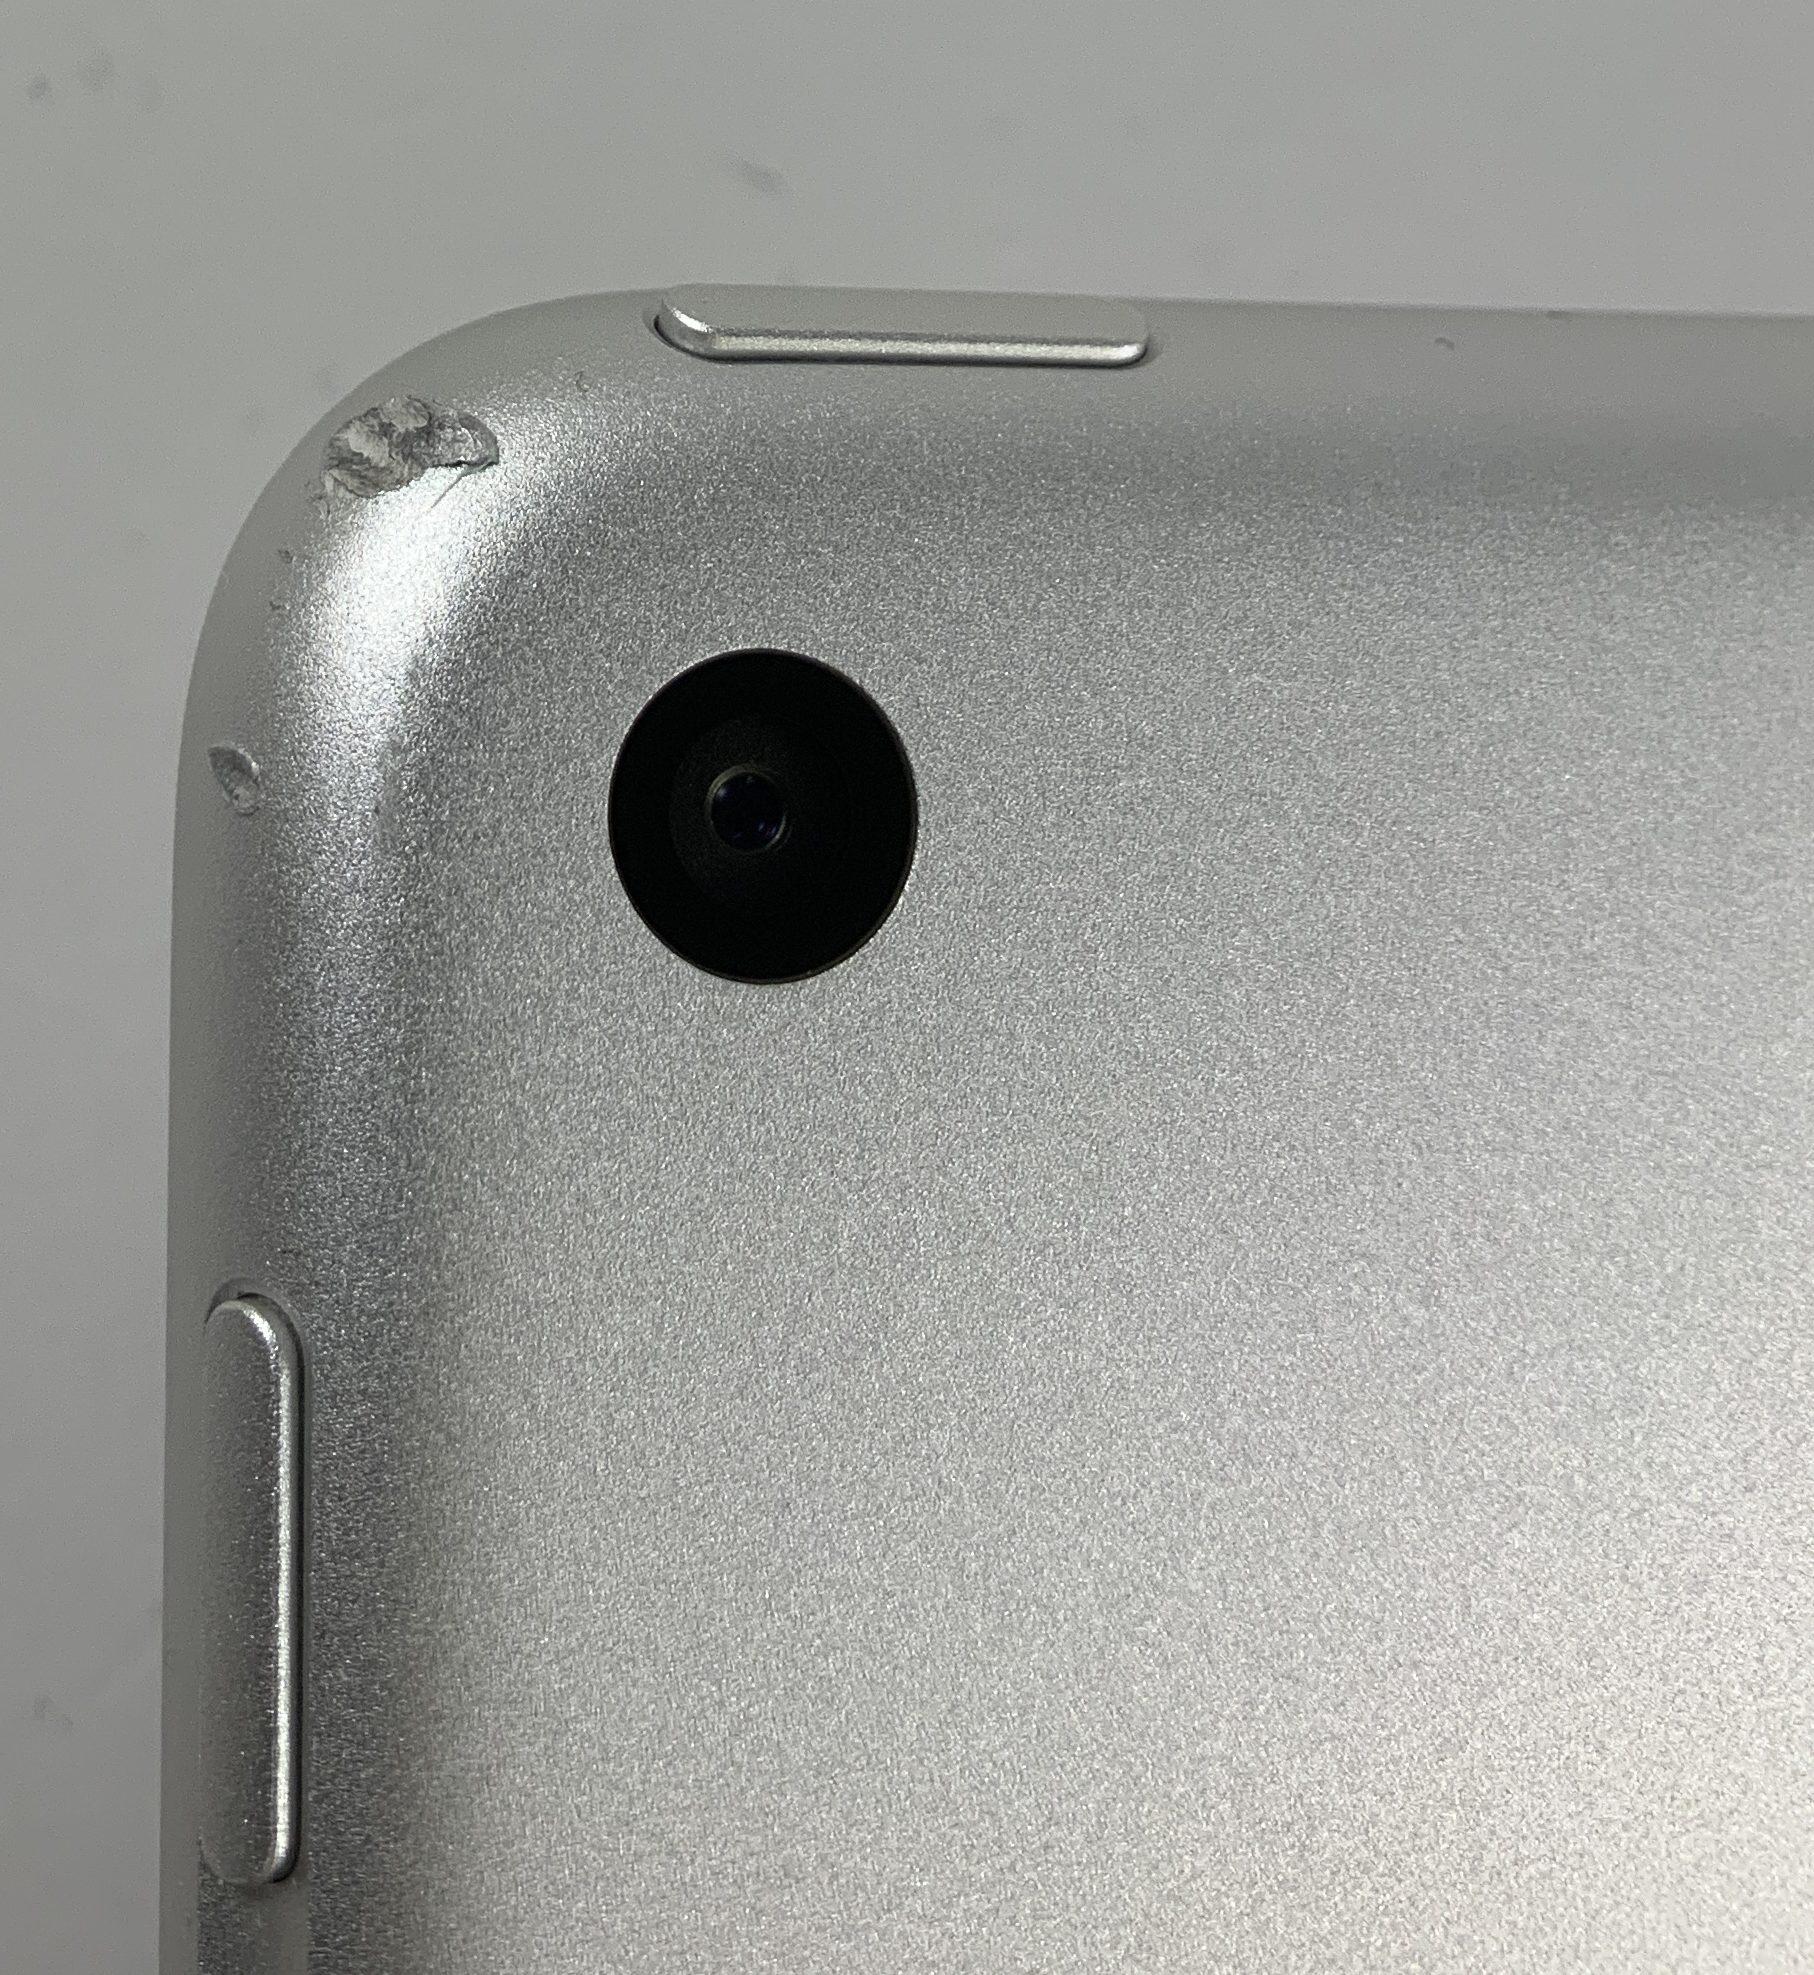 iPad Air 3 Wi-Fi + Cellular 64GB, 64GB, Silver, bild 3